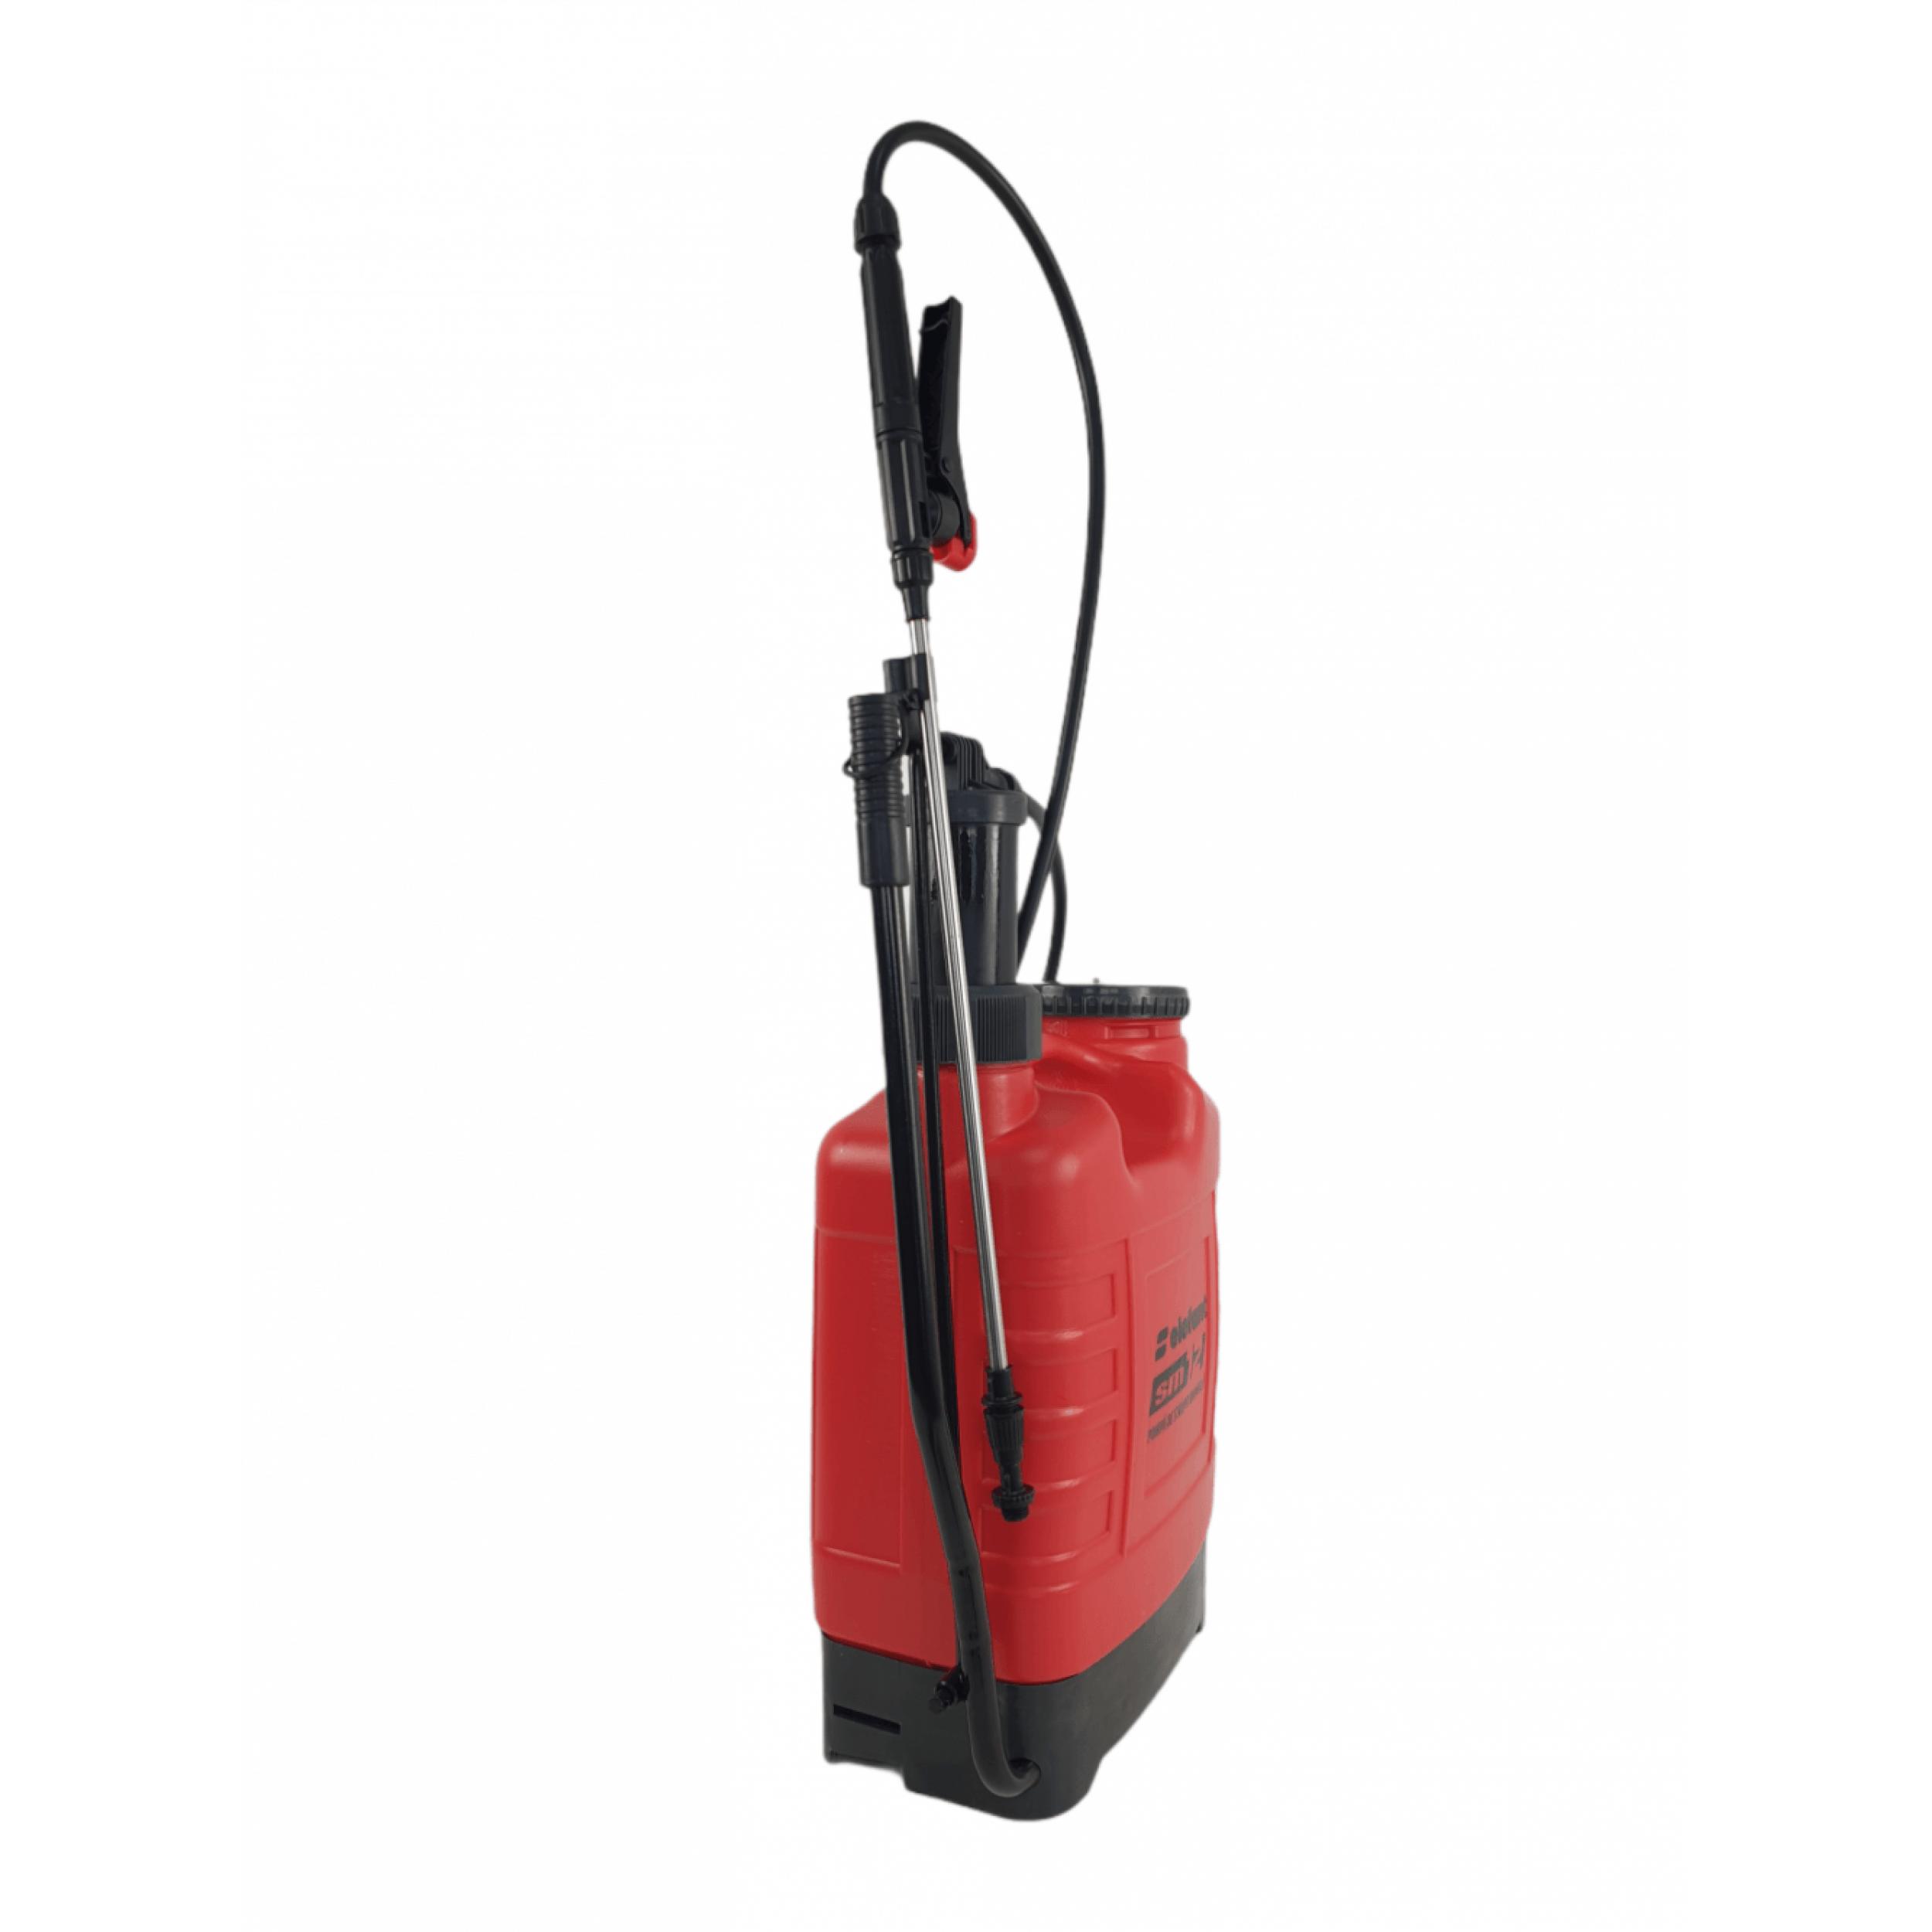 Pompa de stropit manuala Elefant SM12L, Volum 12l, 3 tipuri de pulverizare